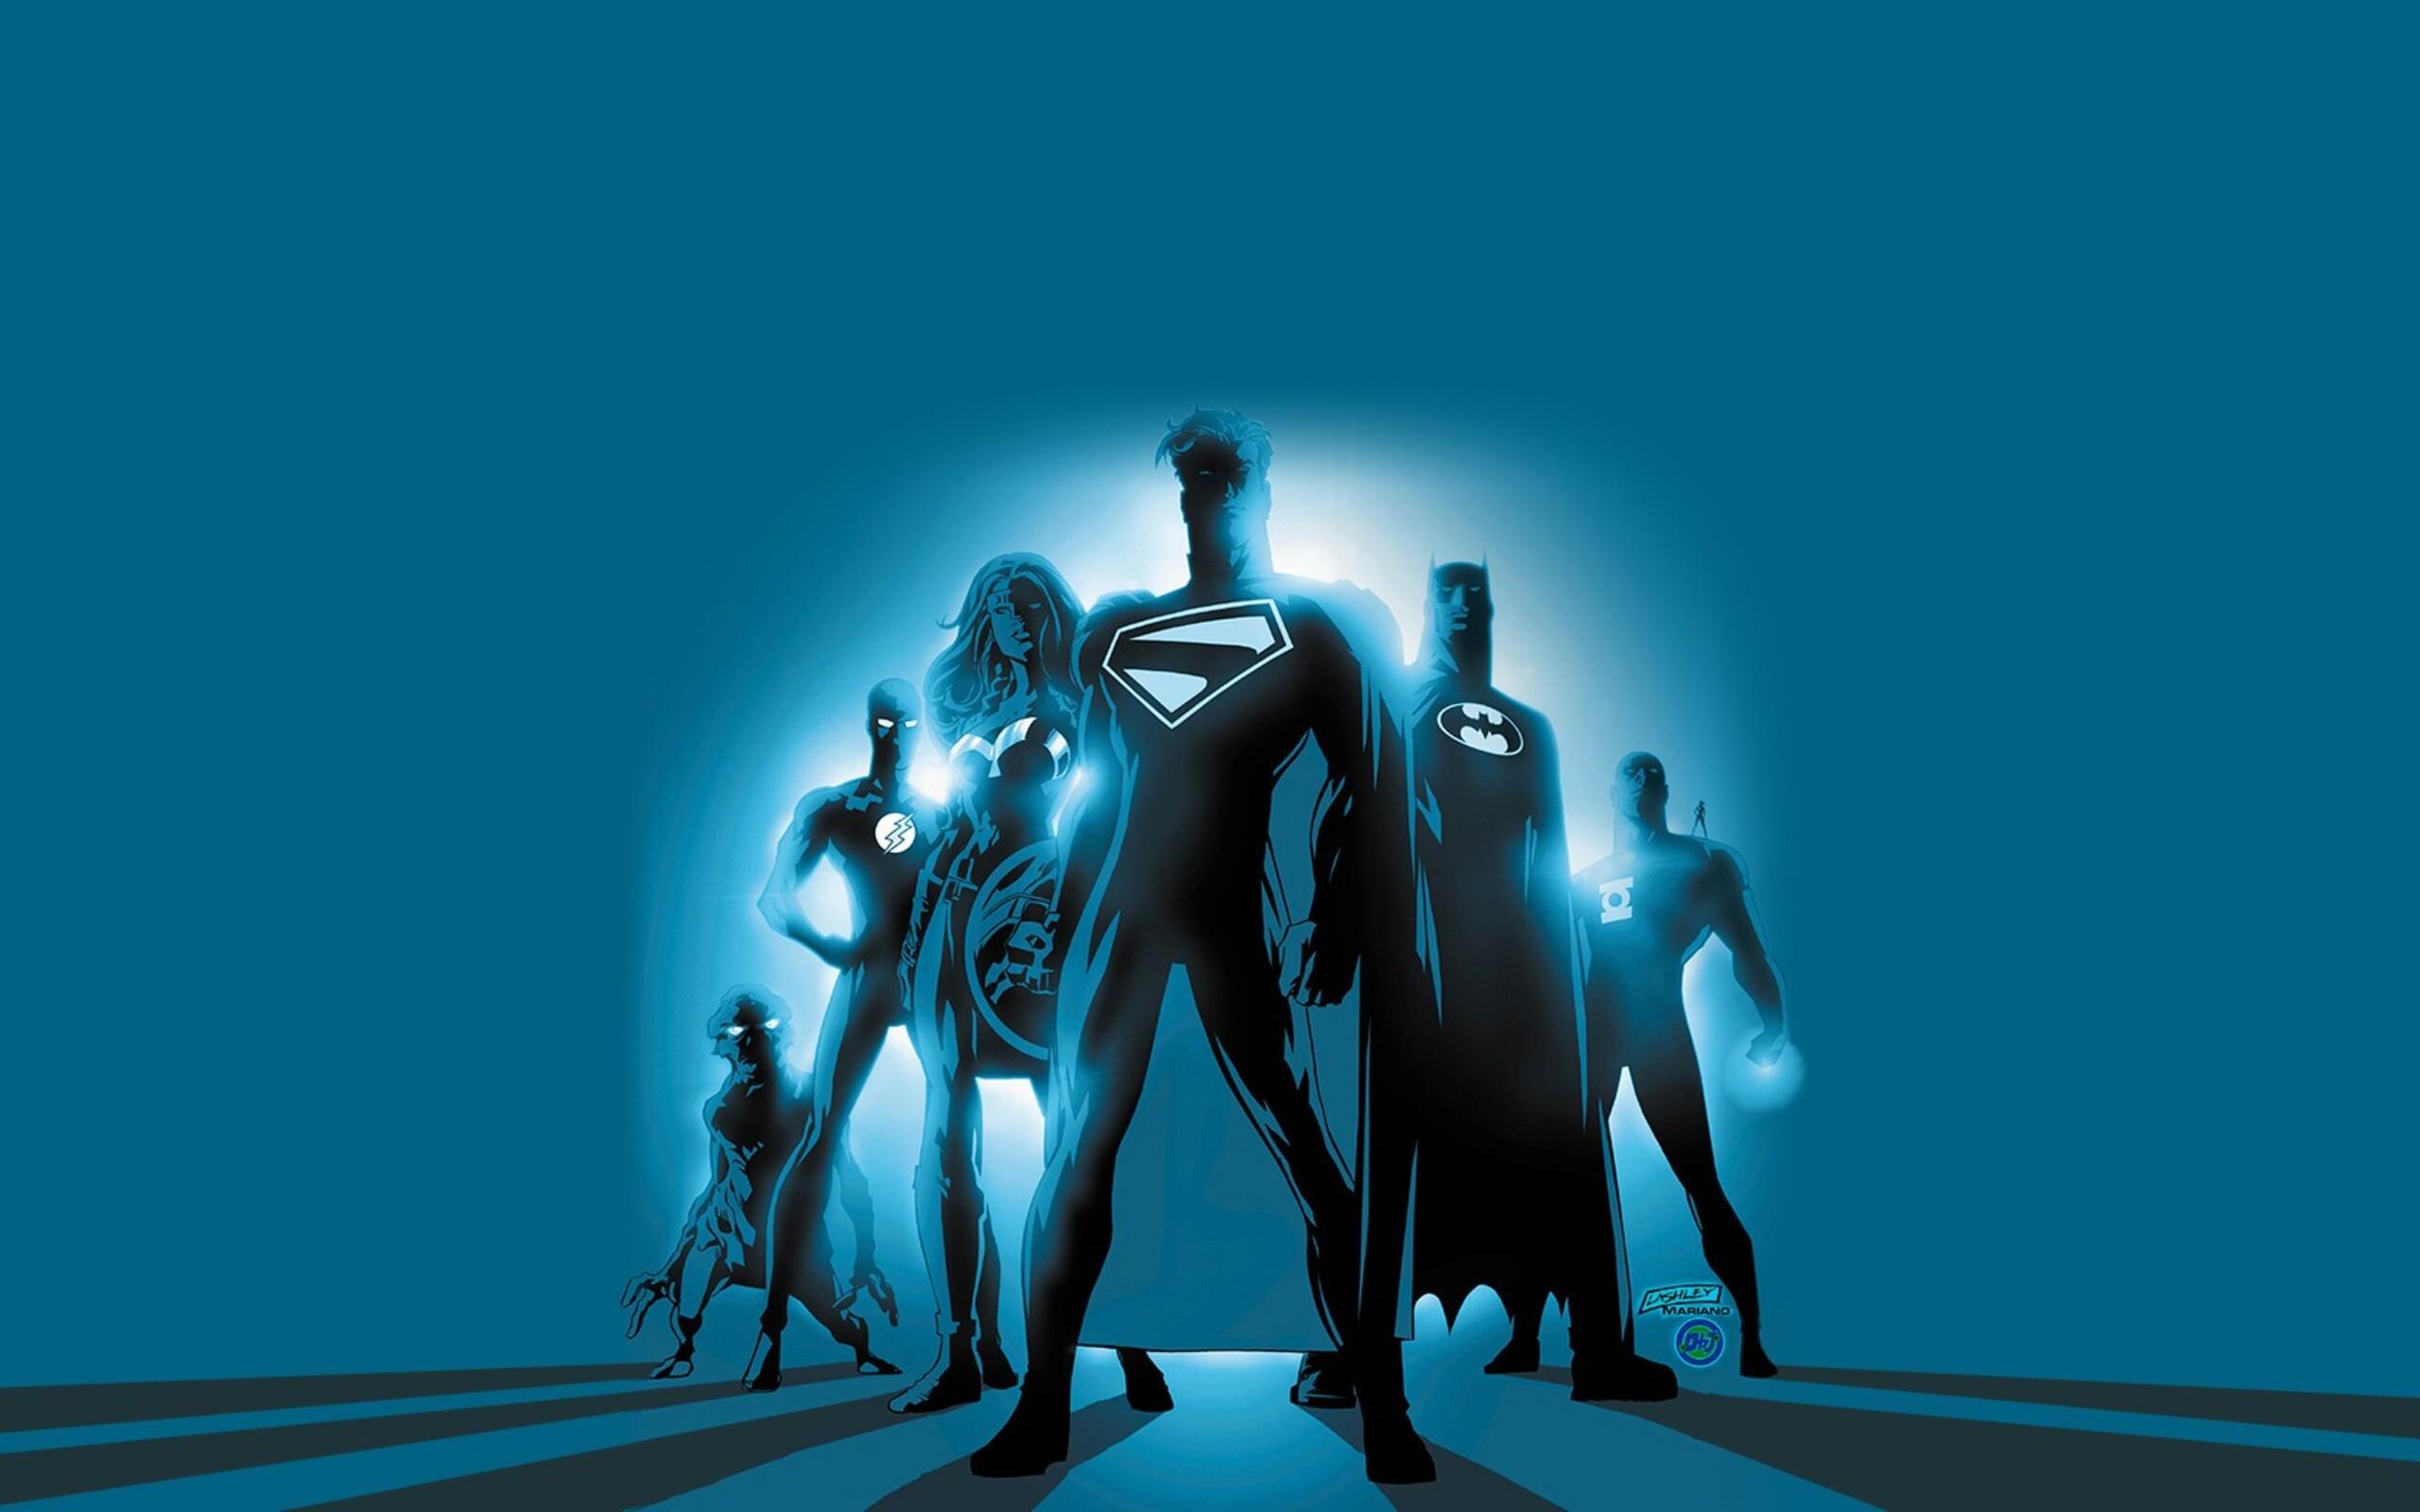 2560x1600 justice league artwork 2560x1600 resolution hd 4k